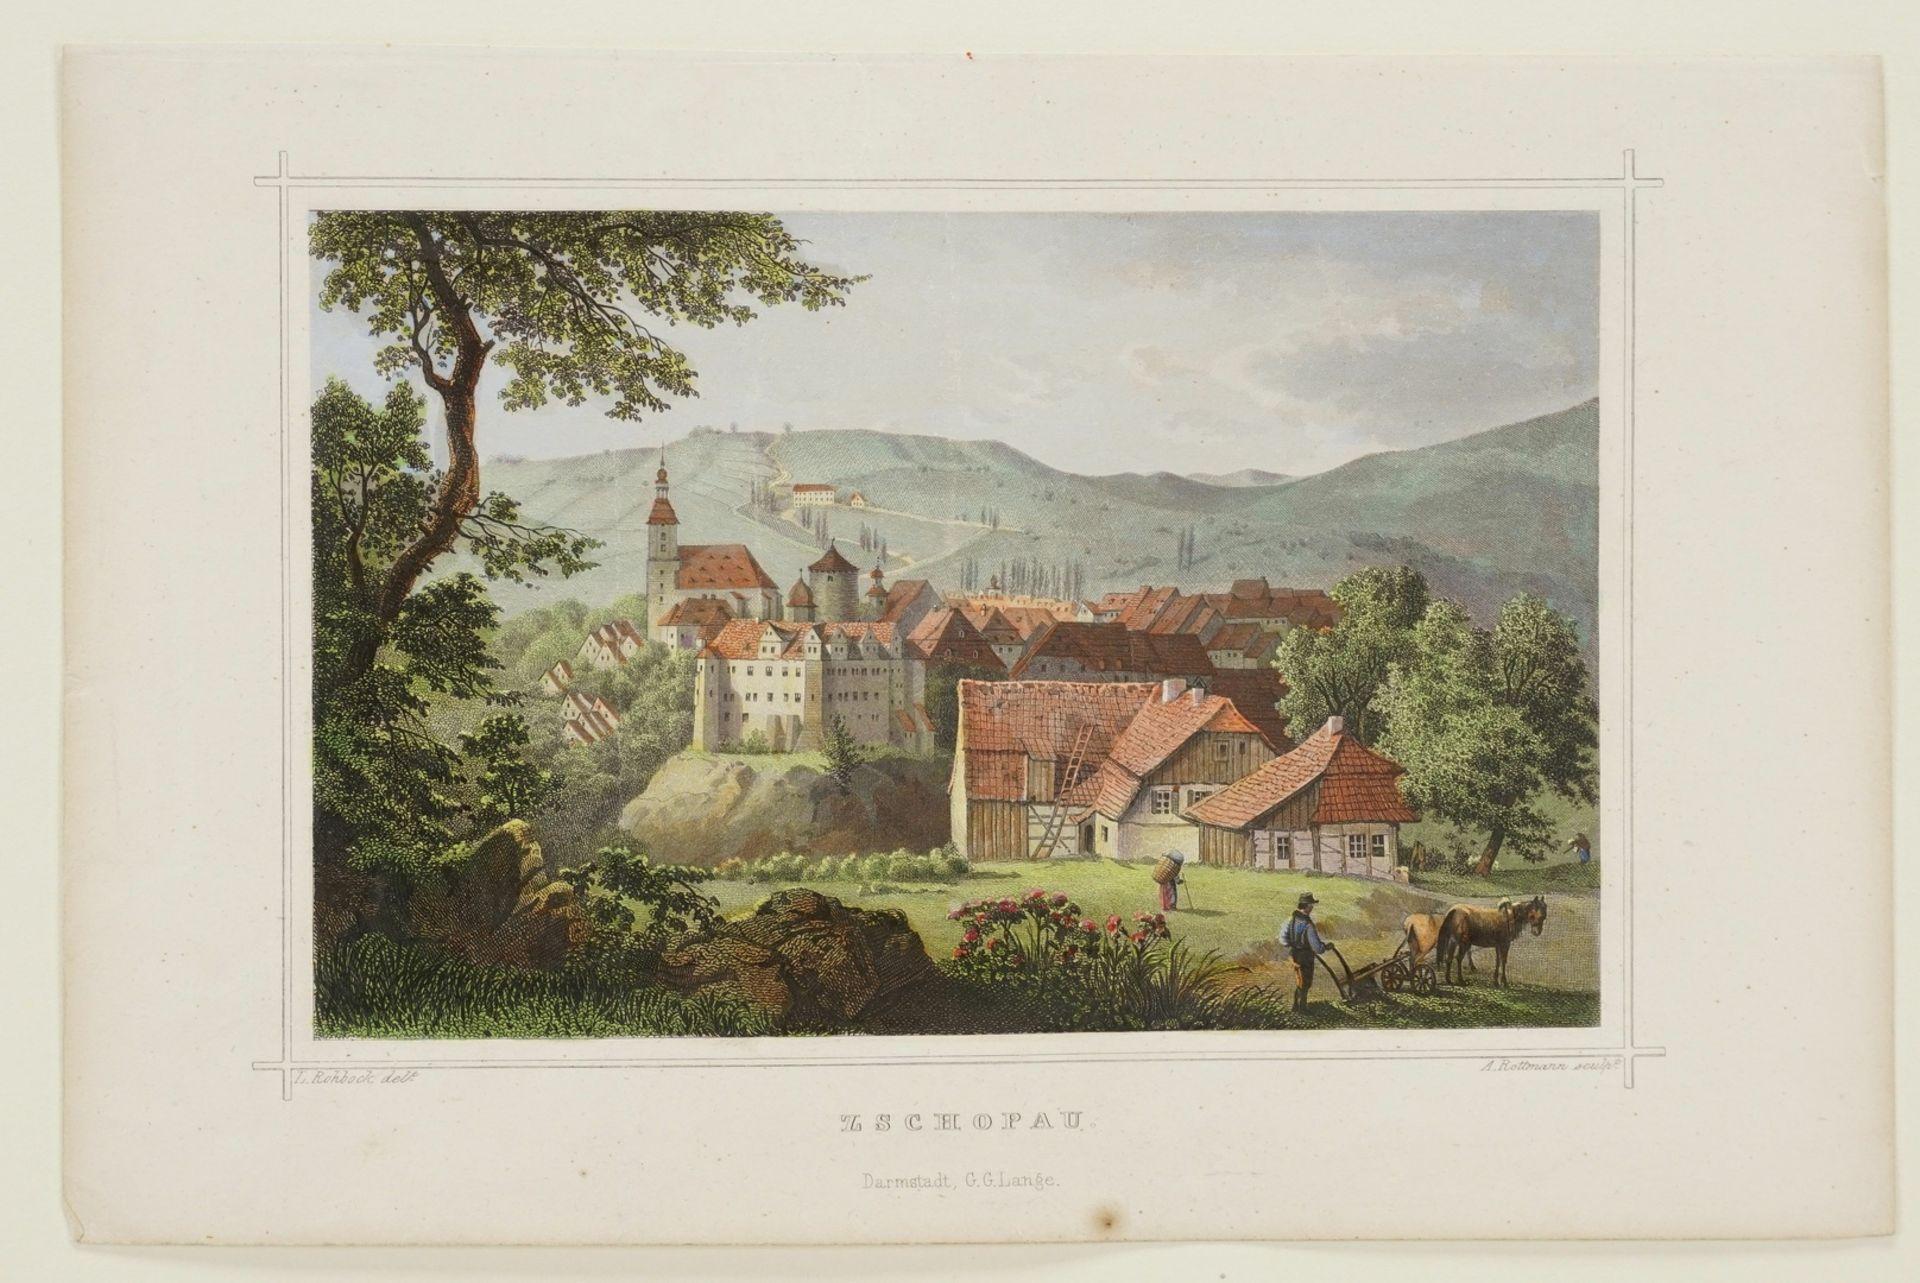 Zschopau (Erzgebirge) - Bild 3 aus 3